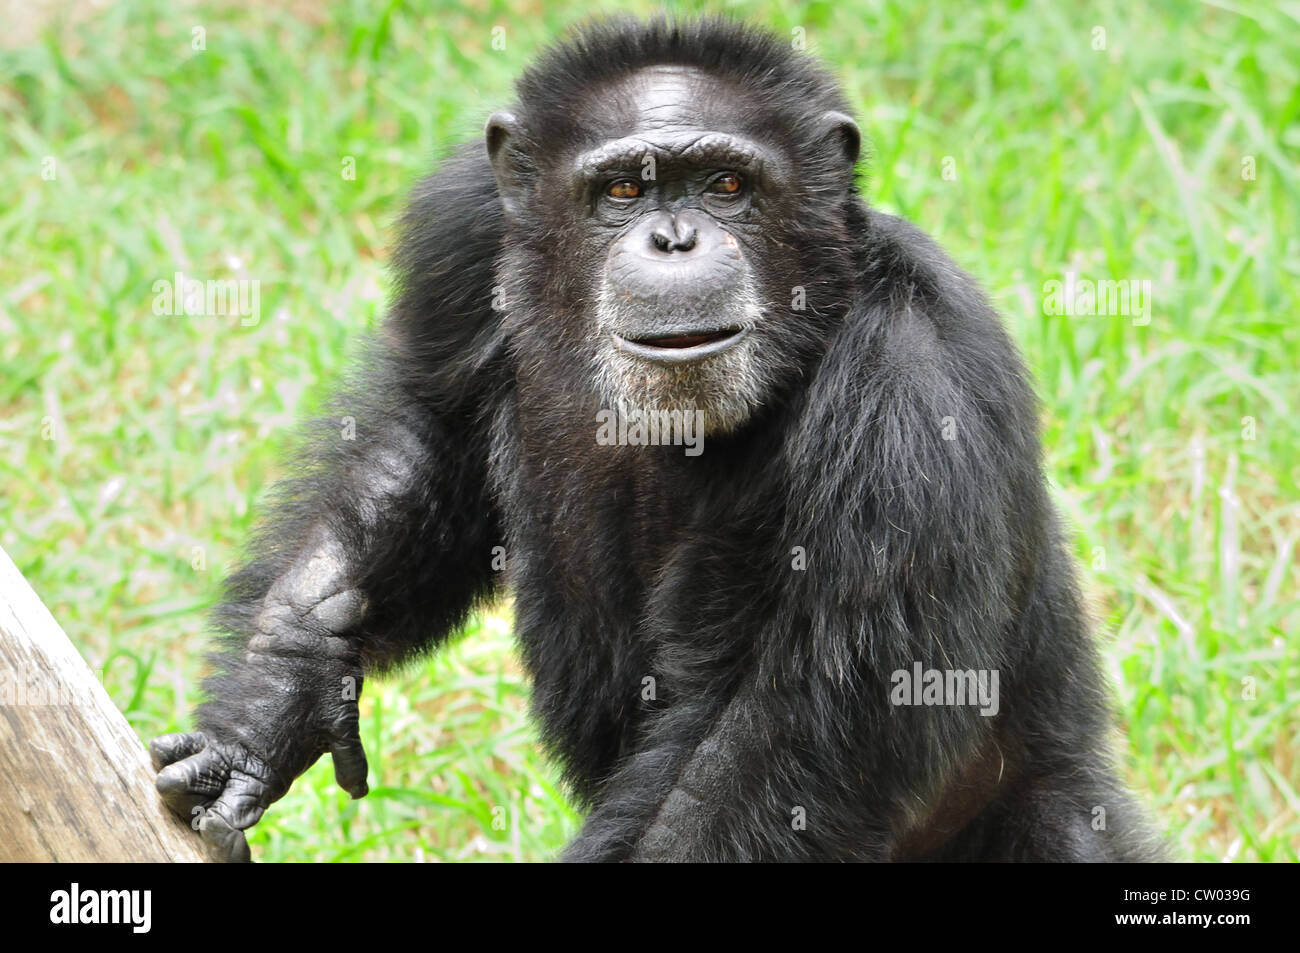 Gorilla - Stock Image